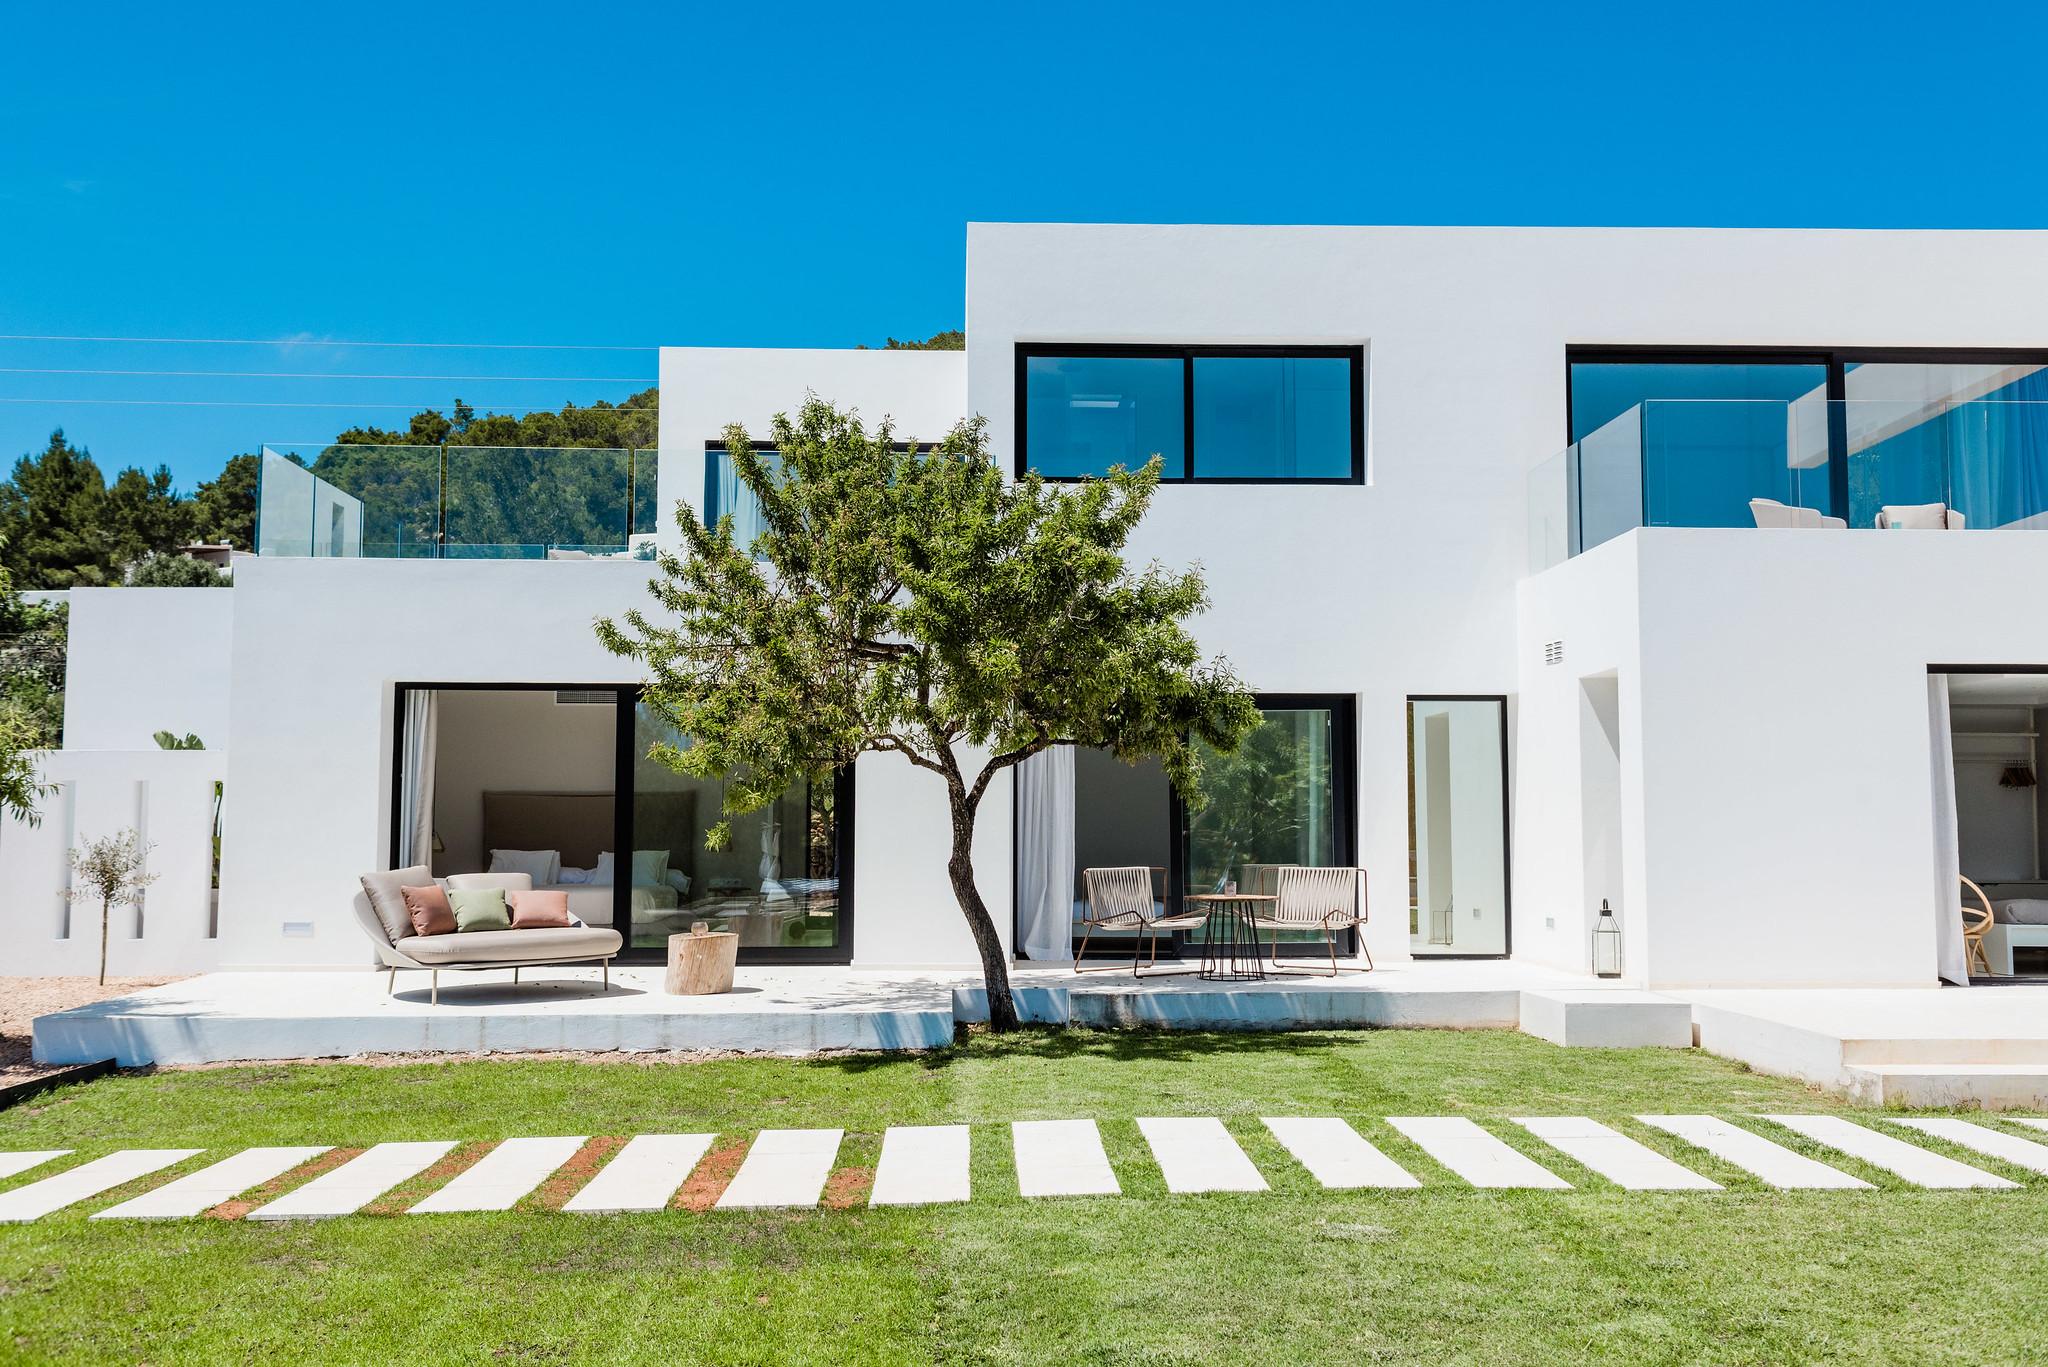 https://www.white-ibiza.com/wp-content/uploads/2020/06/white-ibiza-villas-can-carmen-exterior-house-view.jpg